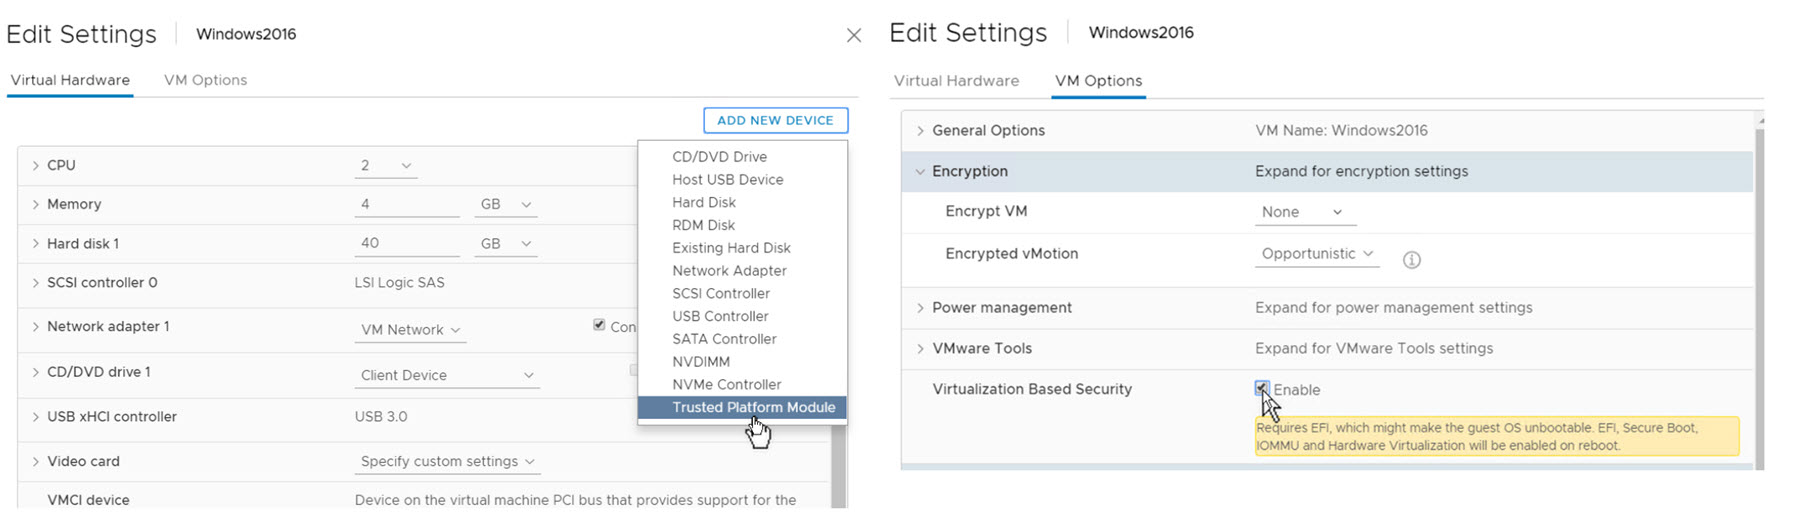 VMware vSphere 6 7 Security Features | ESX Virtualization